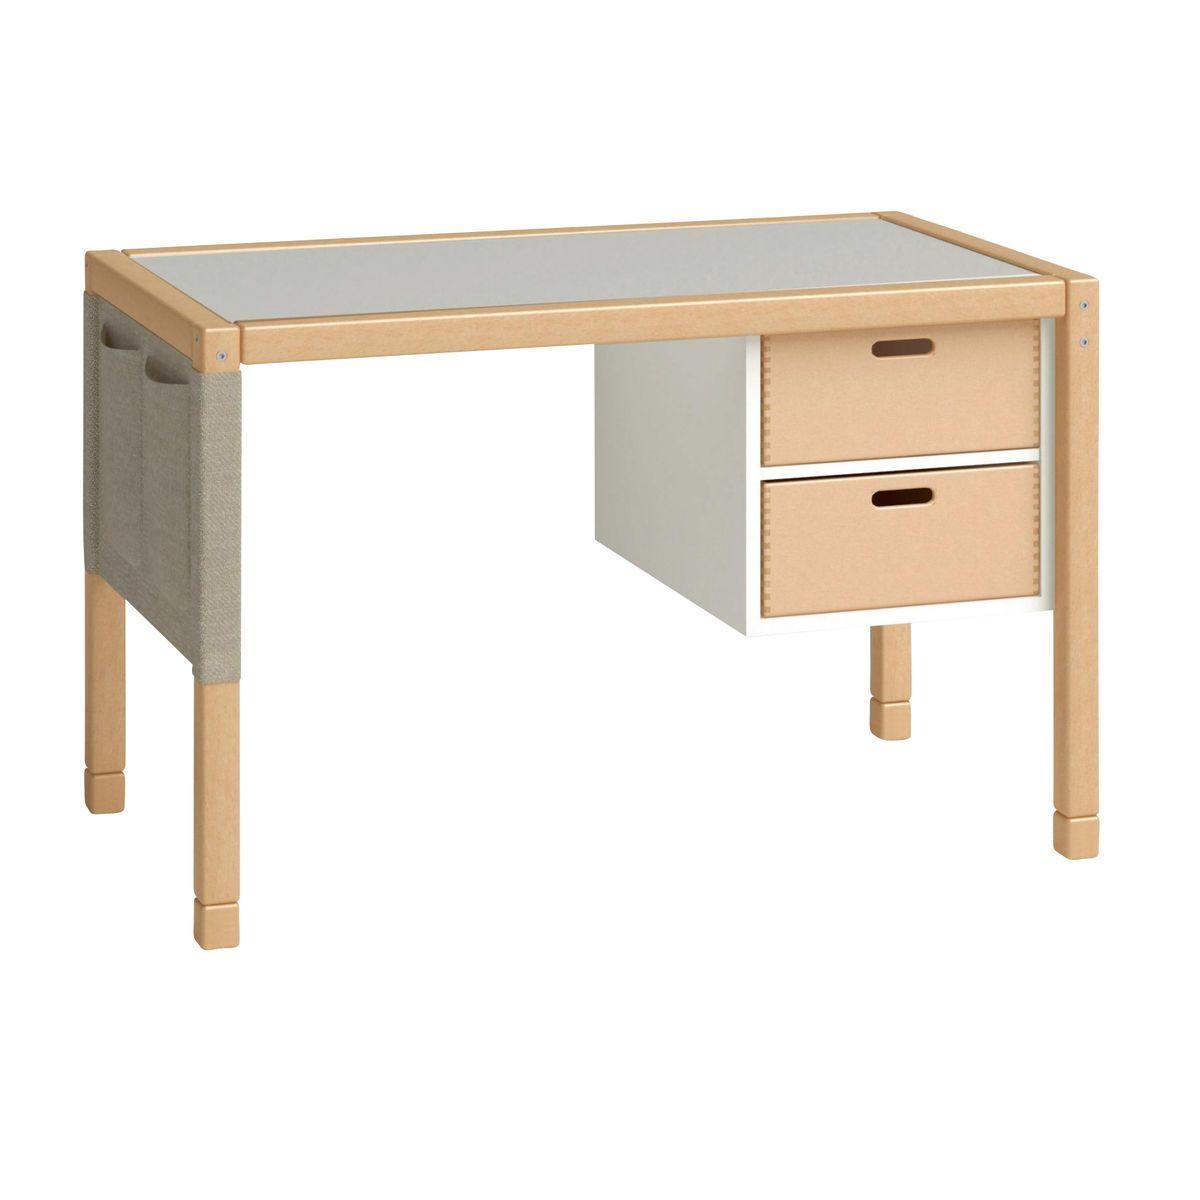 fl totto profilsystem bureau taille junior fl totto. Black Bedroom Furniture Sets. Home Design Ideas